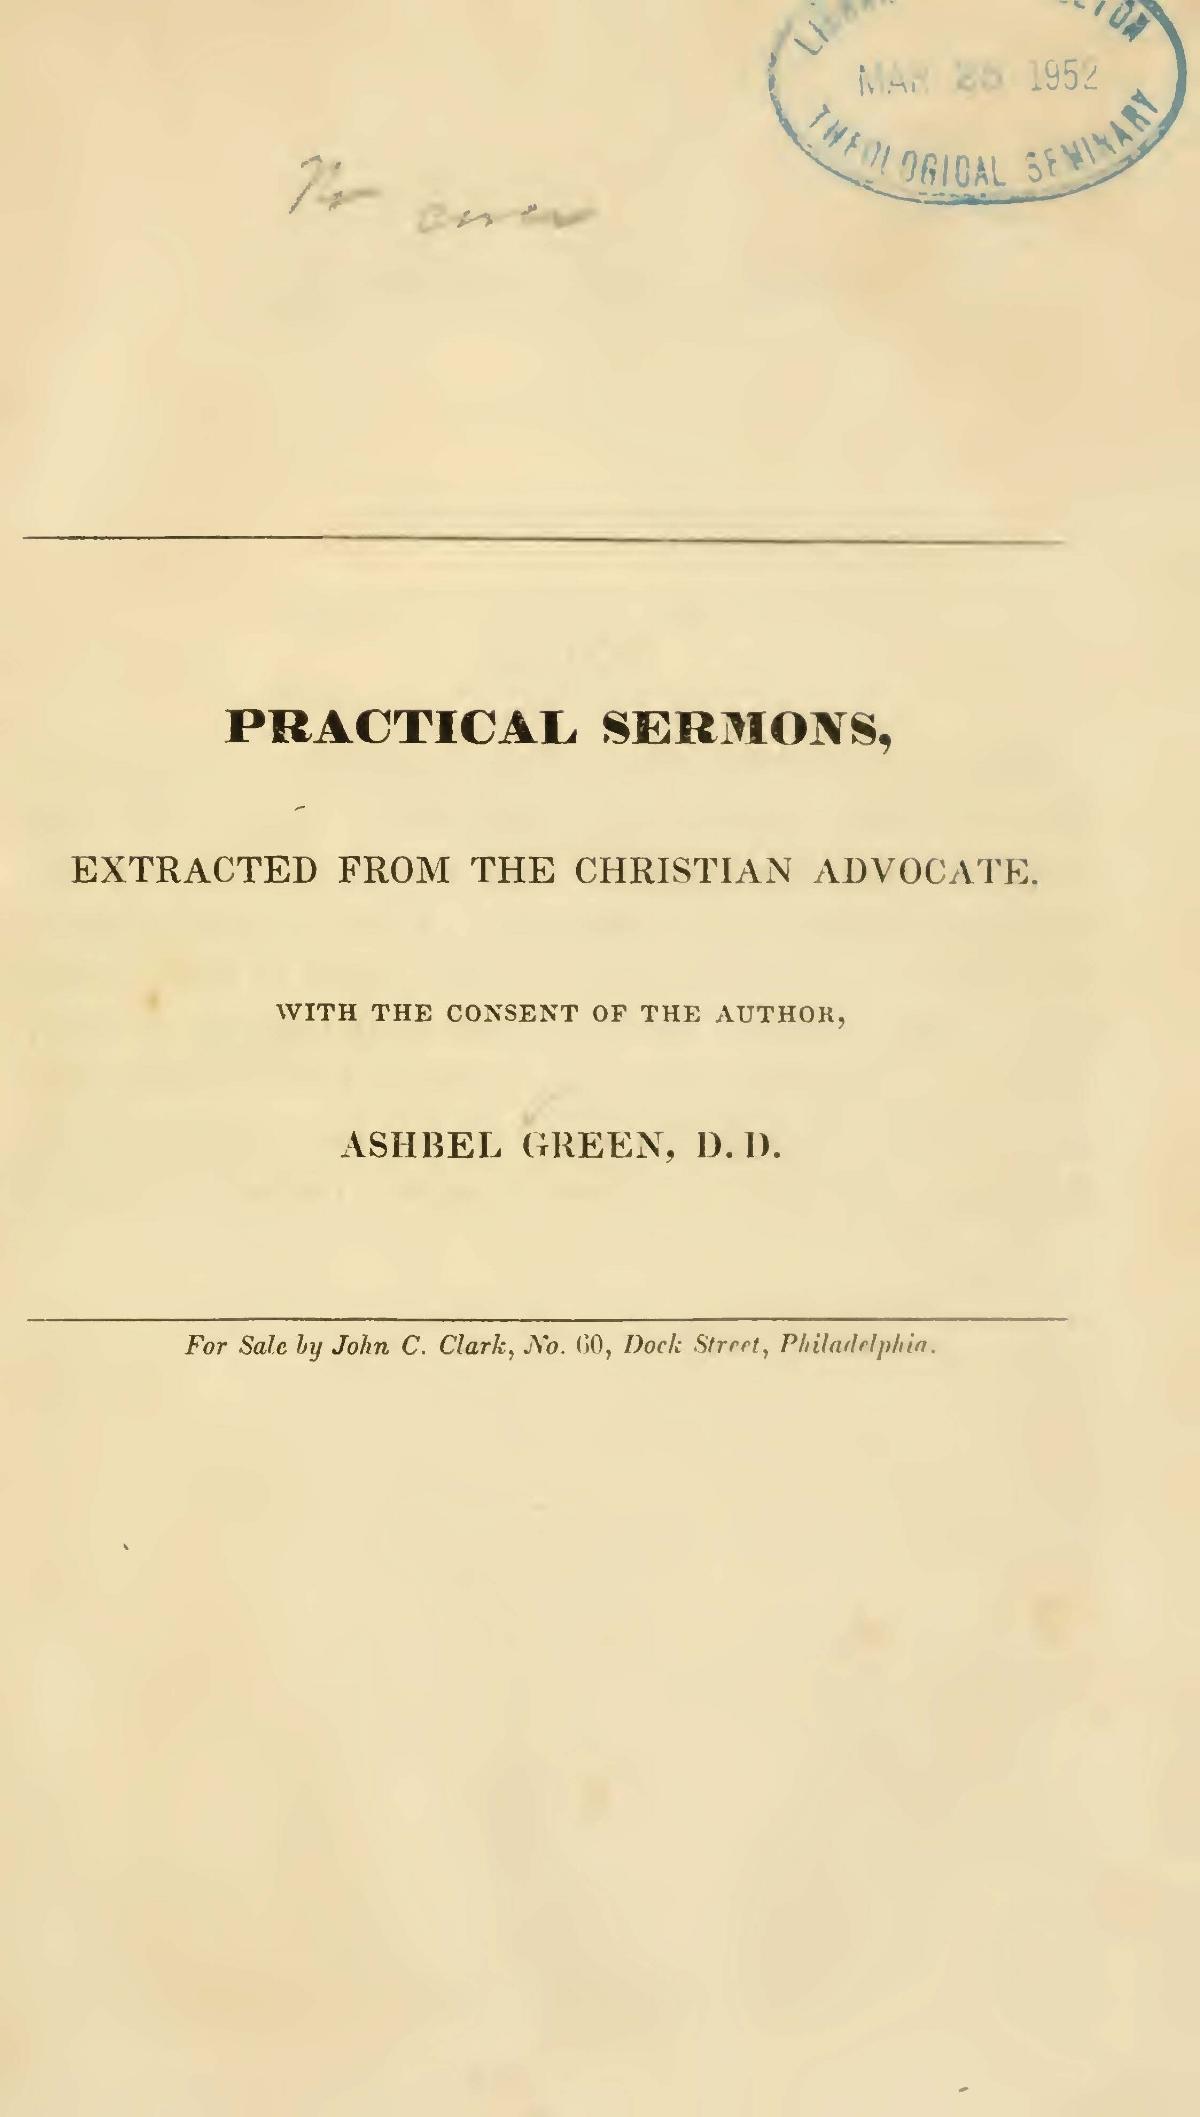 Green, Ashbel, Practical Sermons Title Page.jpg